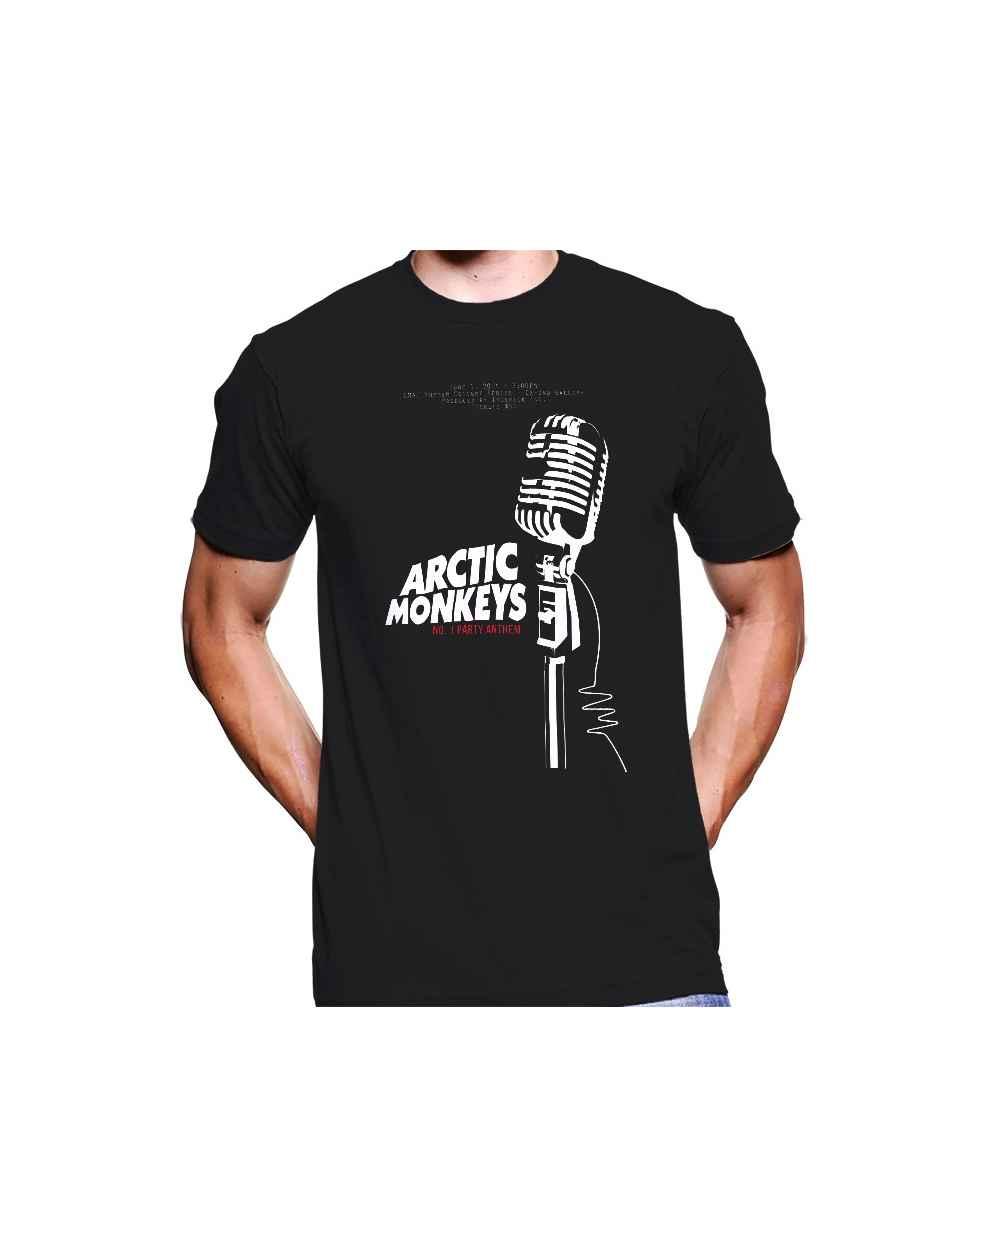 Camiseta Estampada Hombre Arctic Monkeys 20